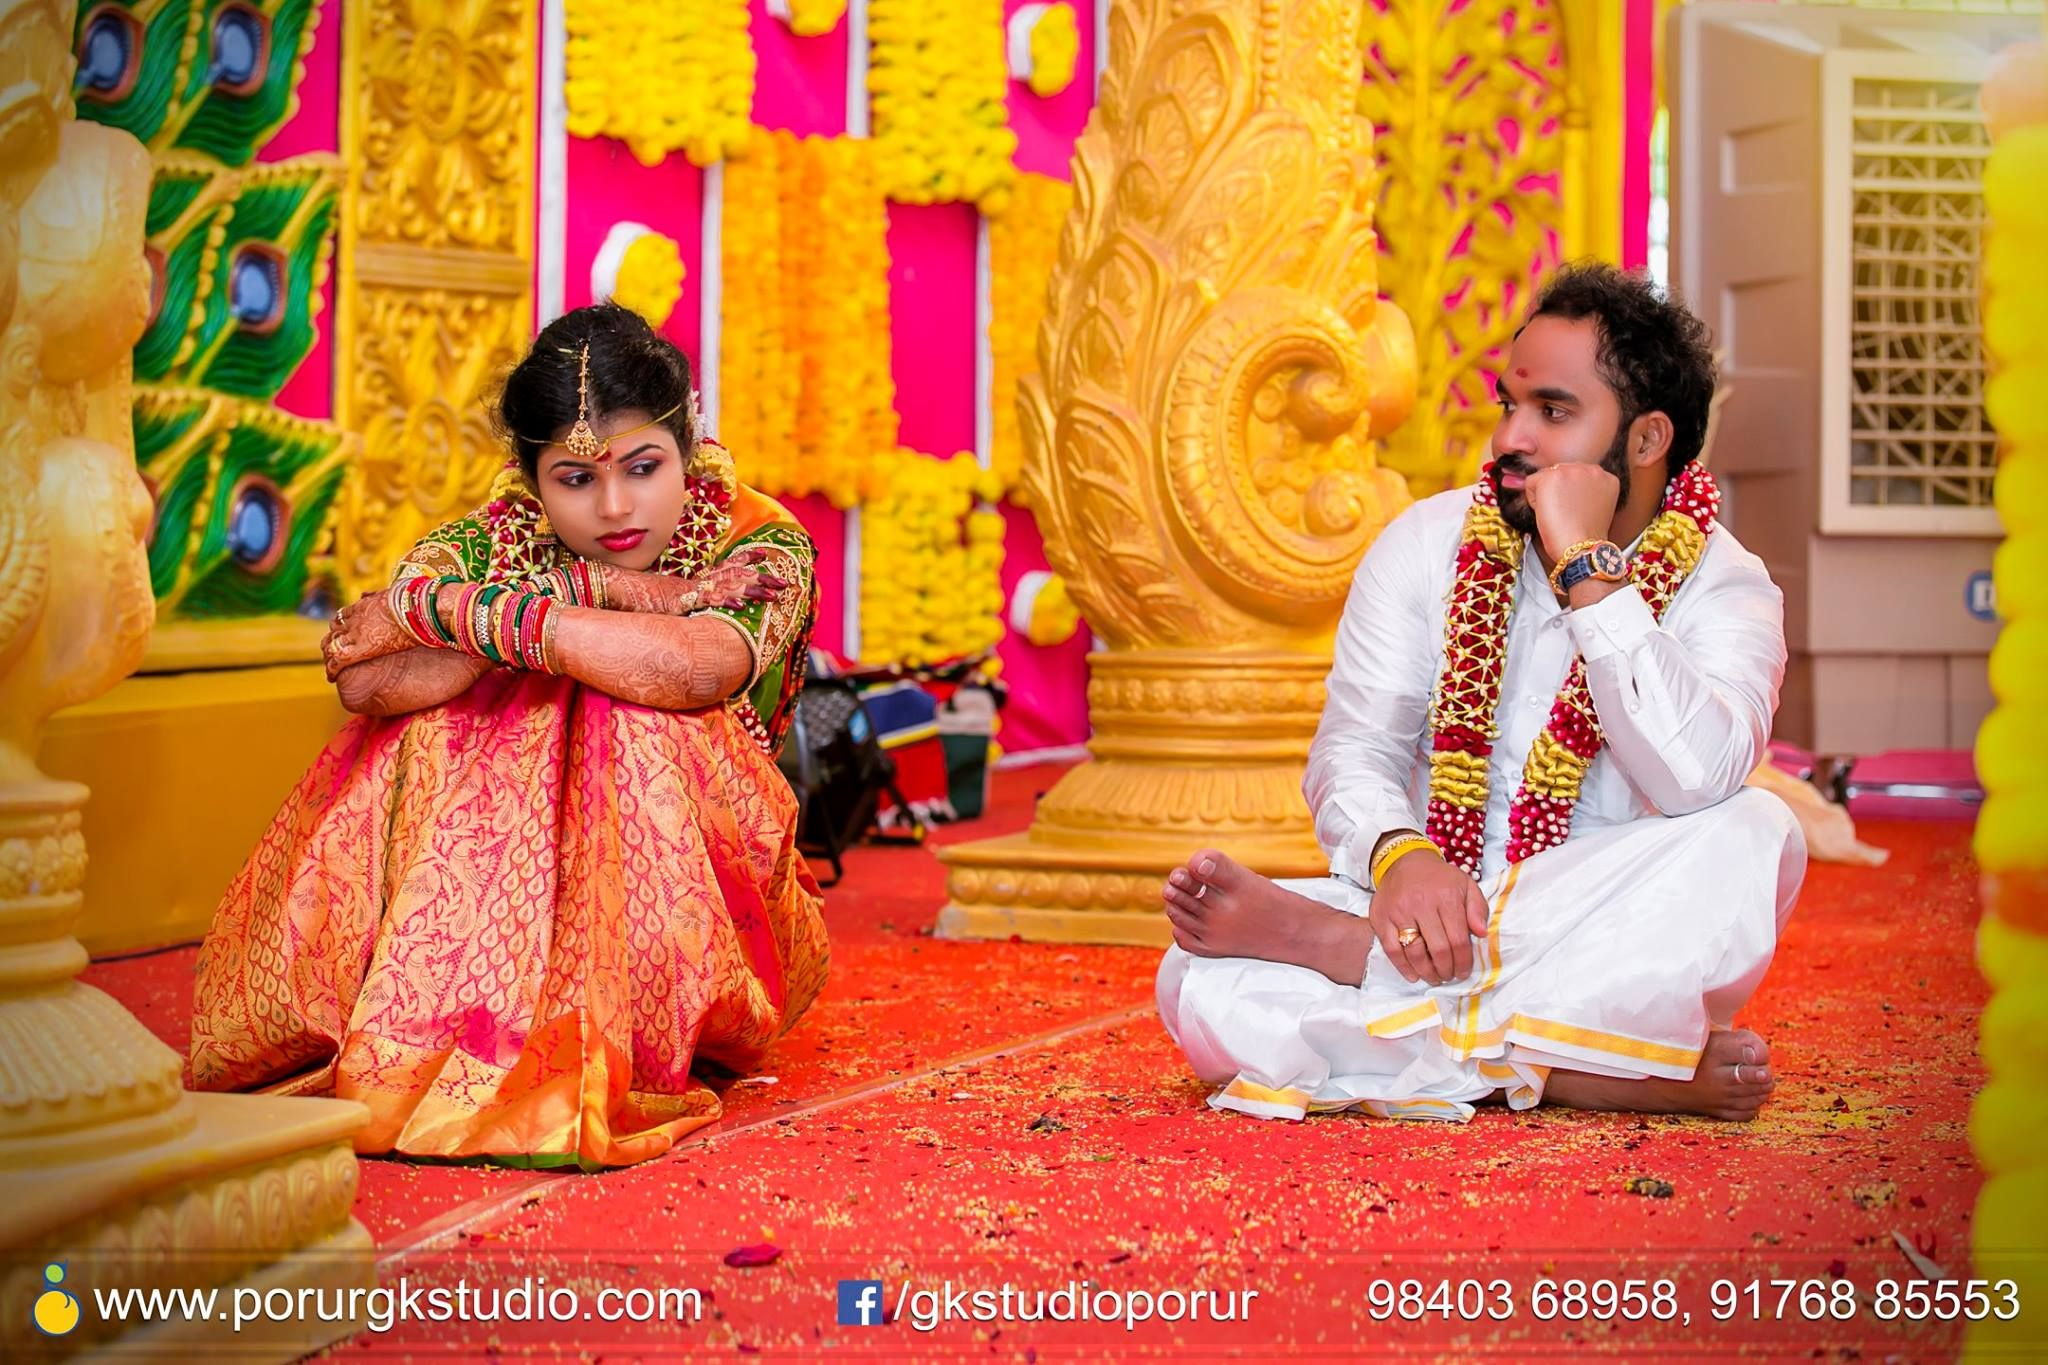 Porurgkstudio Porurgkstudio Tamilnadu Chennai Wedding Photographers Wedding Couple Poses Photography Wedding Couple Poses Wedding Photography Poses Family